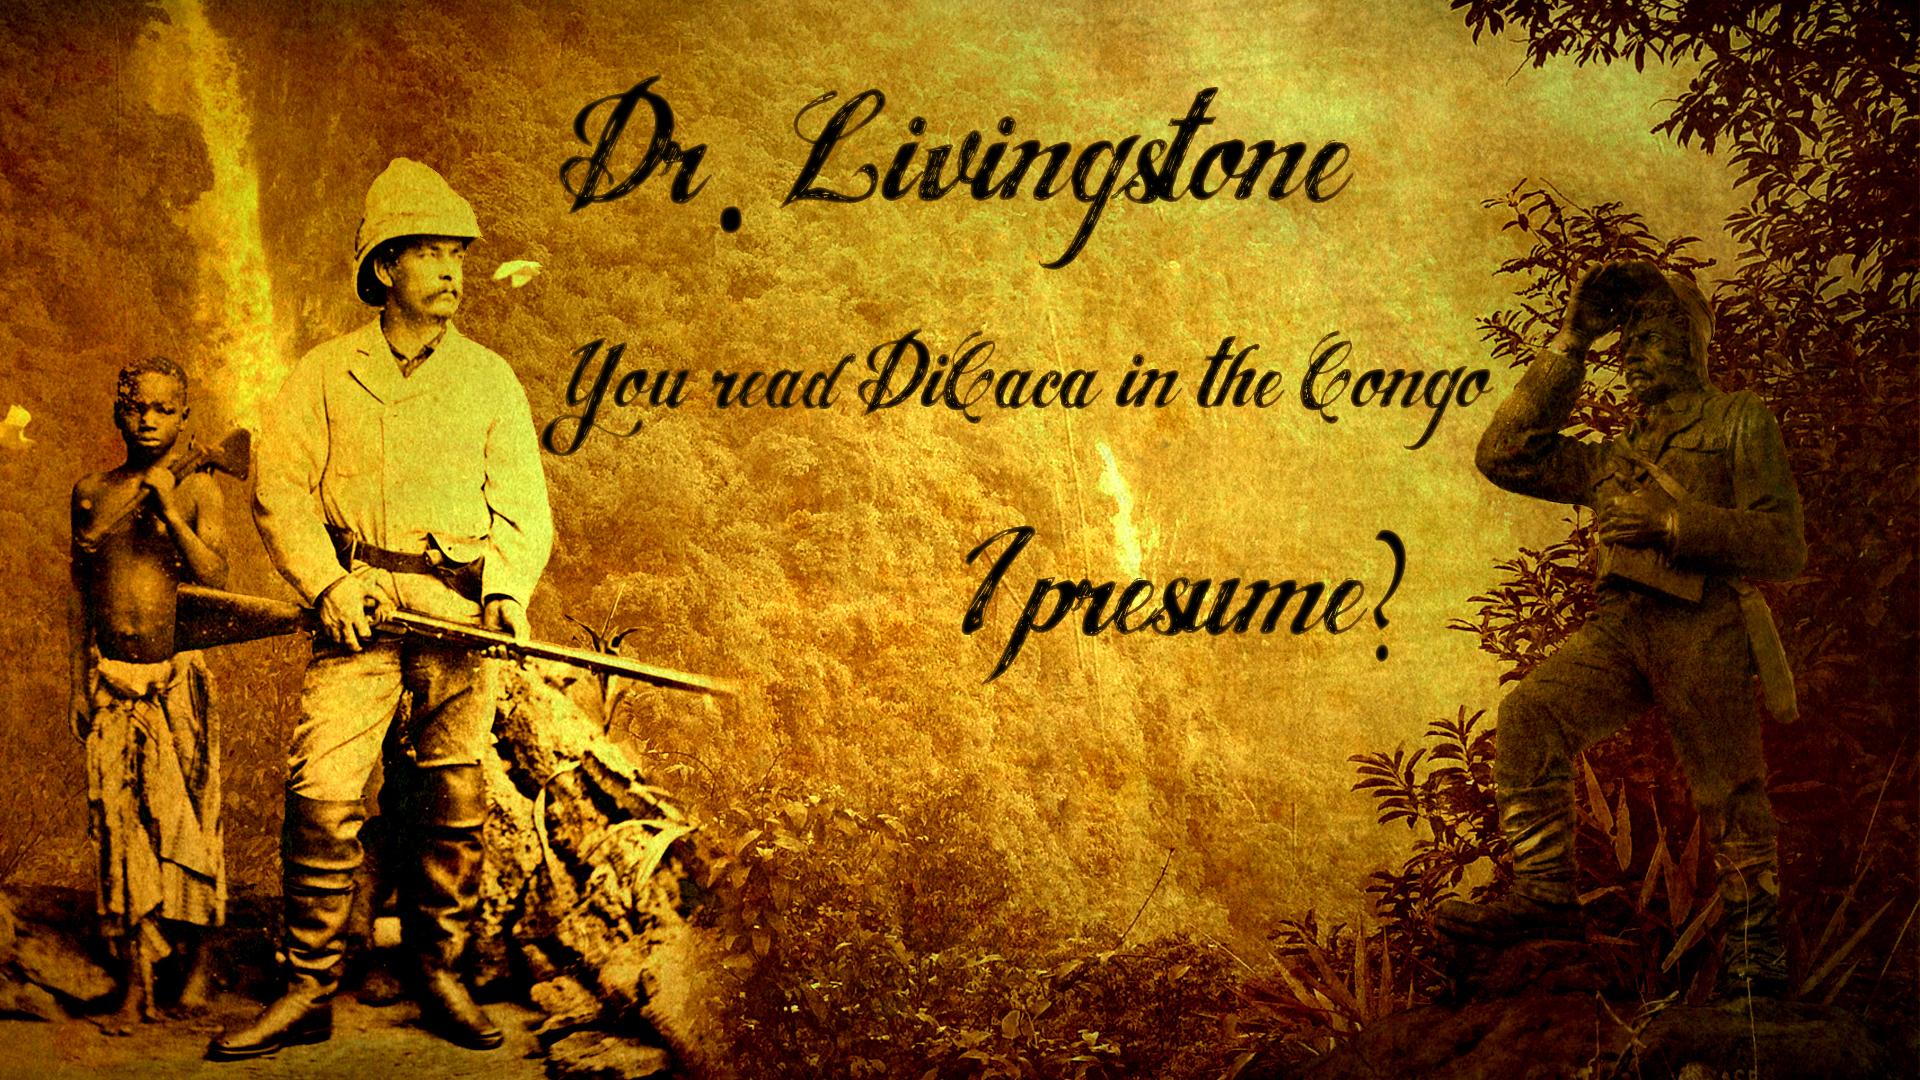 dr livingstone i presume by furiuz - Dr Livingstone I Presume